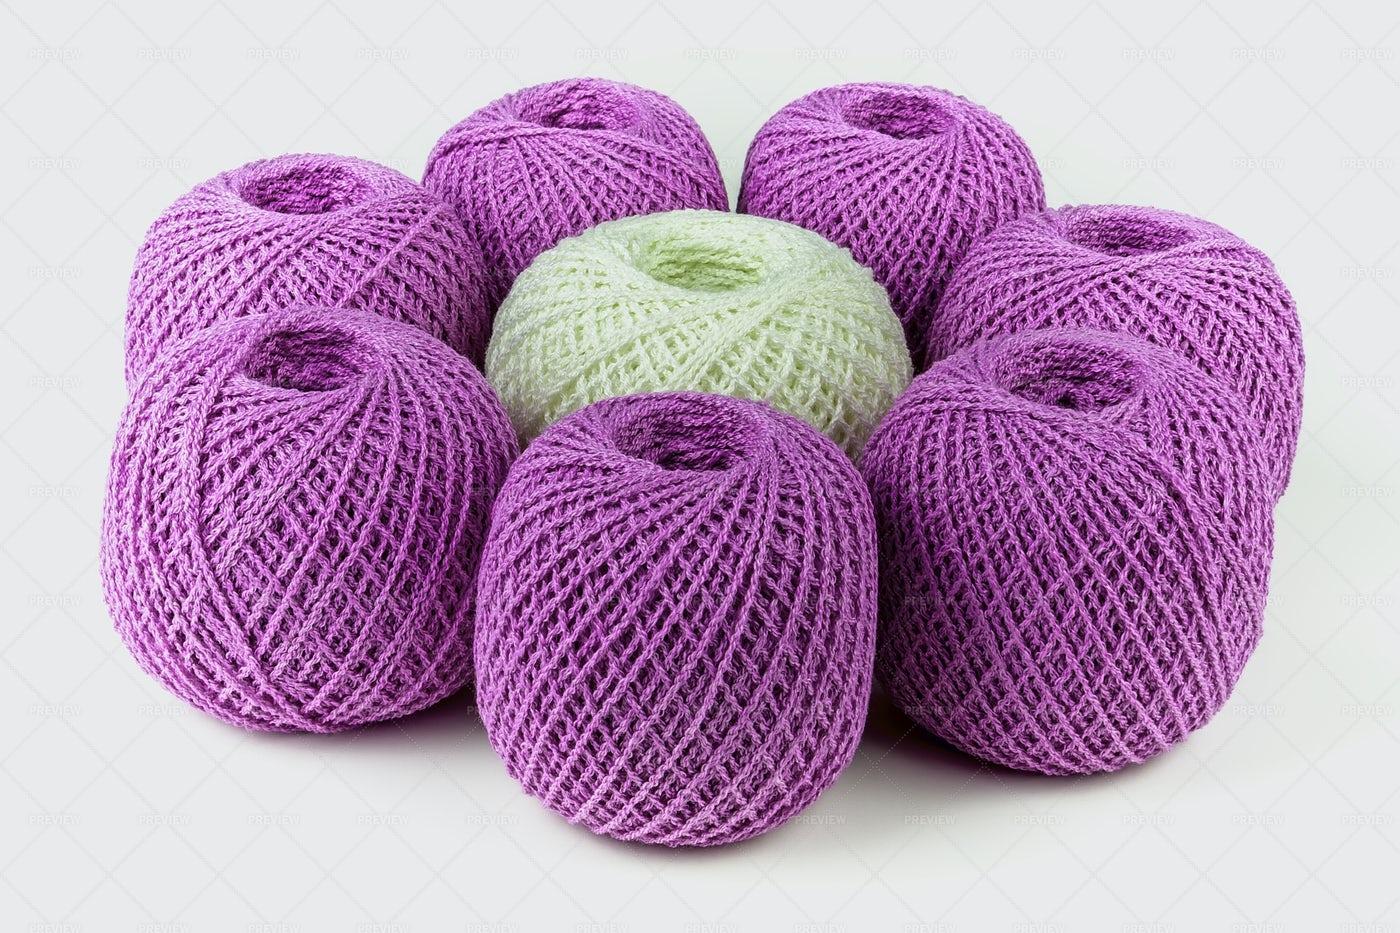 Colorful Ball Of Yarn: Stock Photos